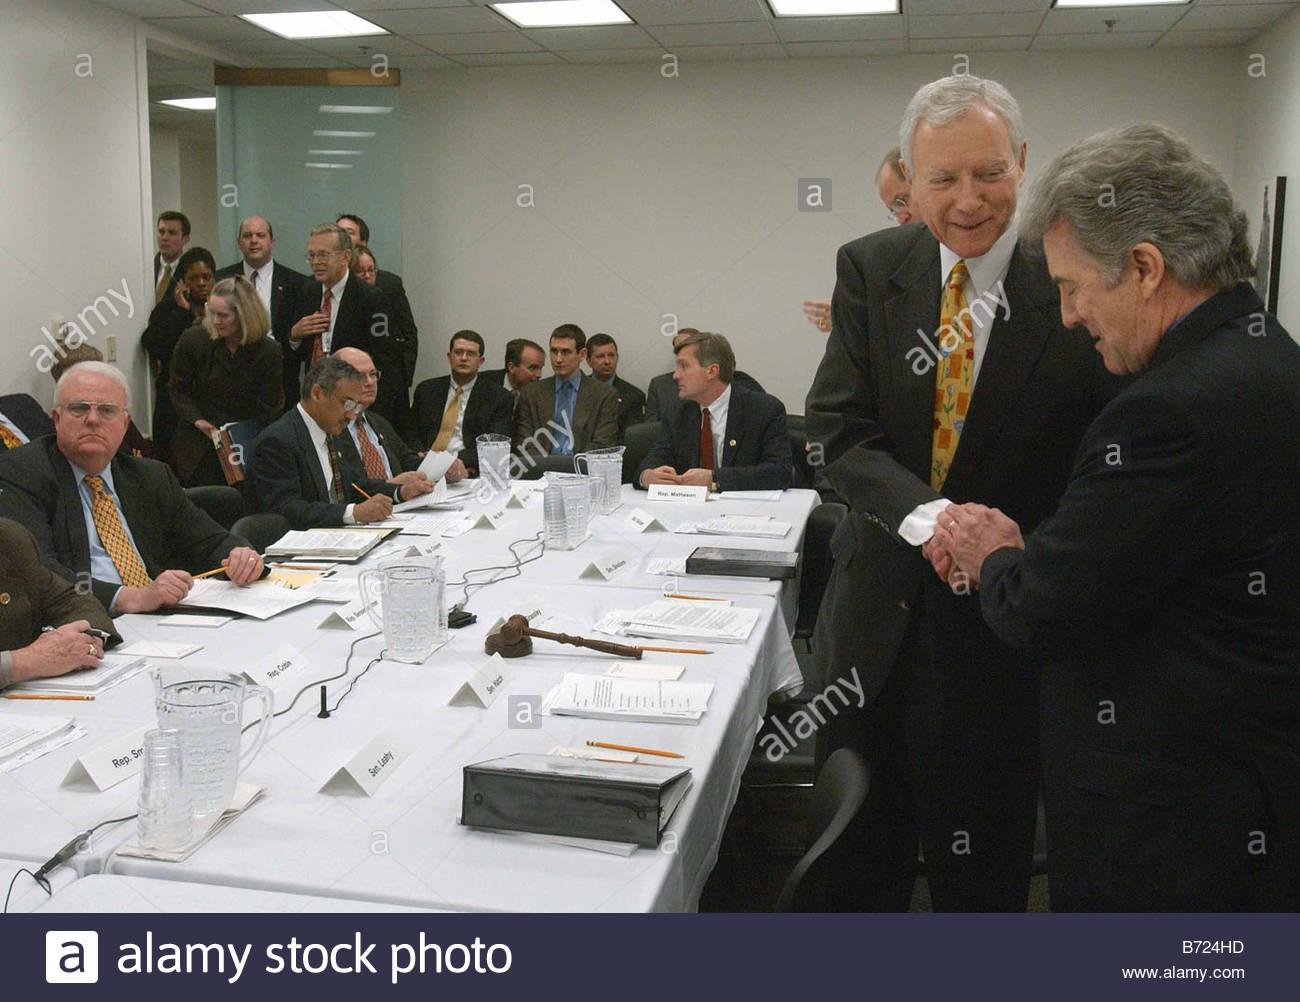 4 8 03 EXPLOITATION OF CHILDREN ACT Senate Judiciary Chairman Orrin G Hatch R Utah yellow tie at right greets John - Stock Image